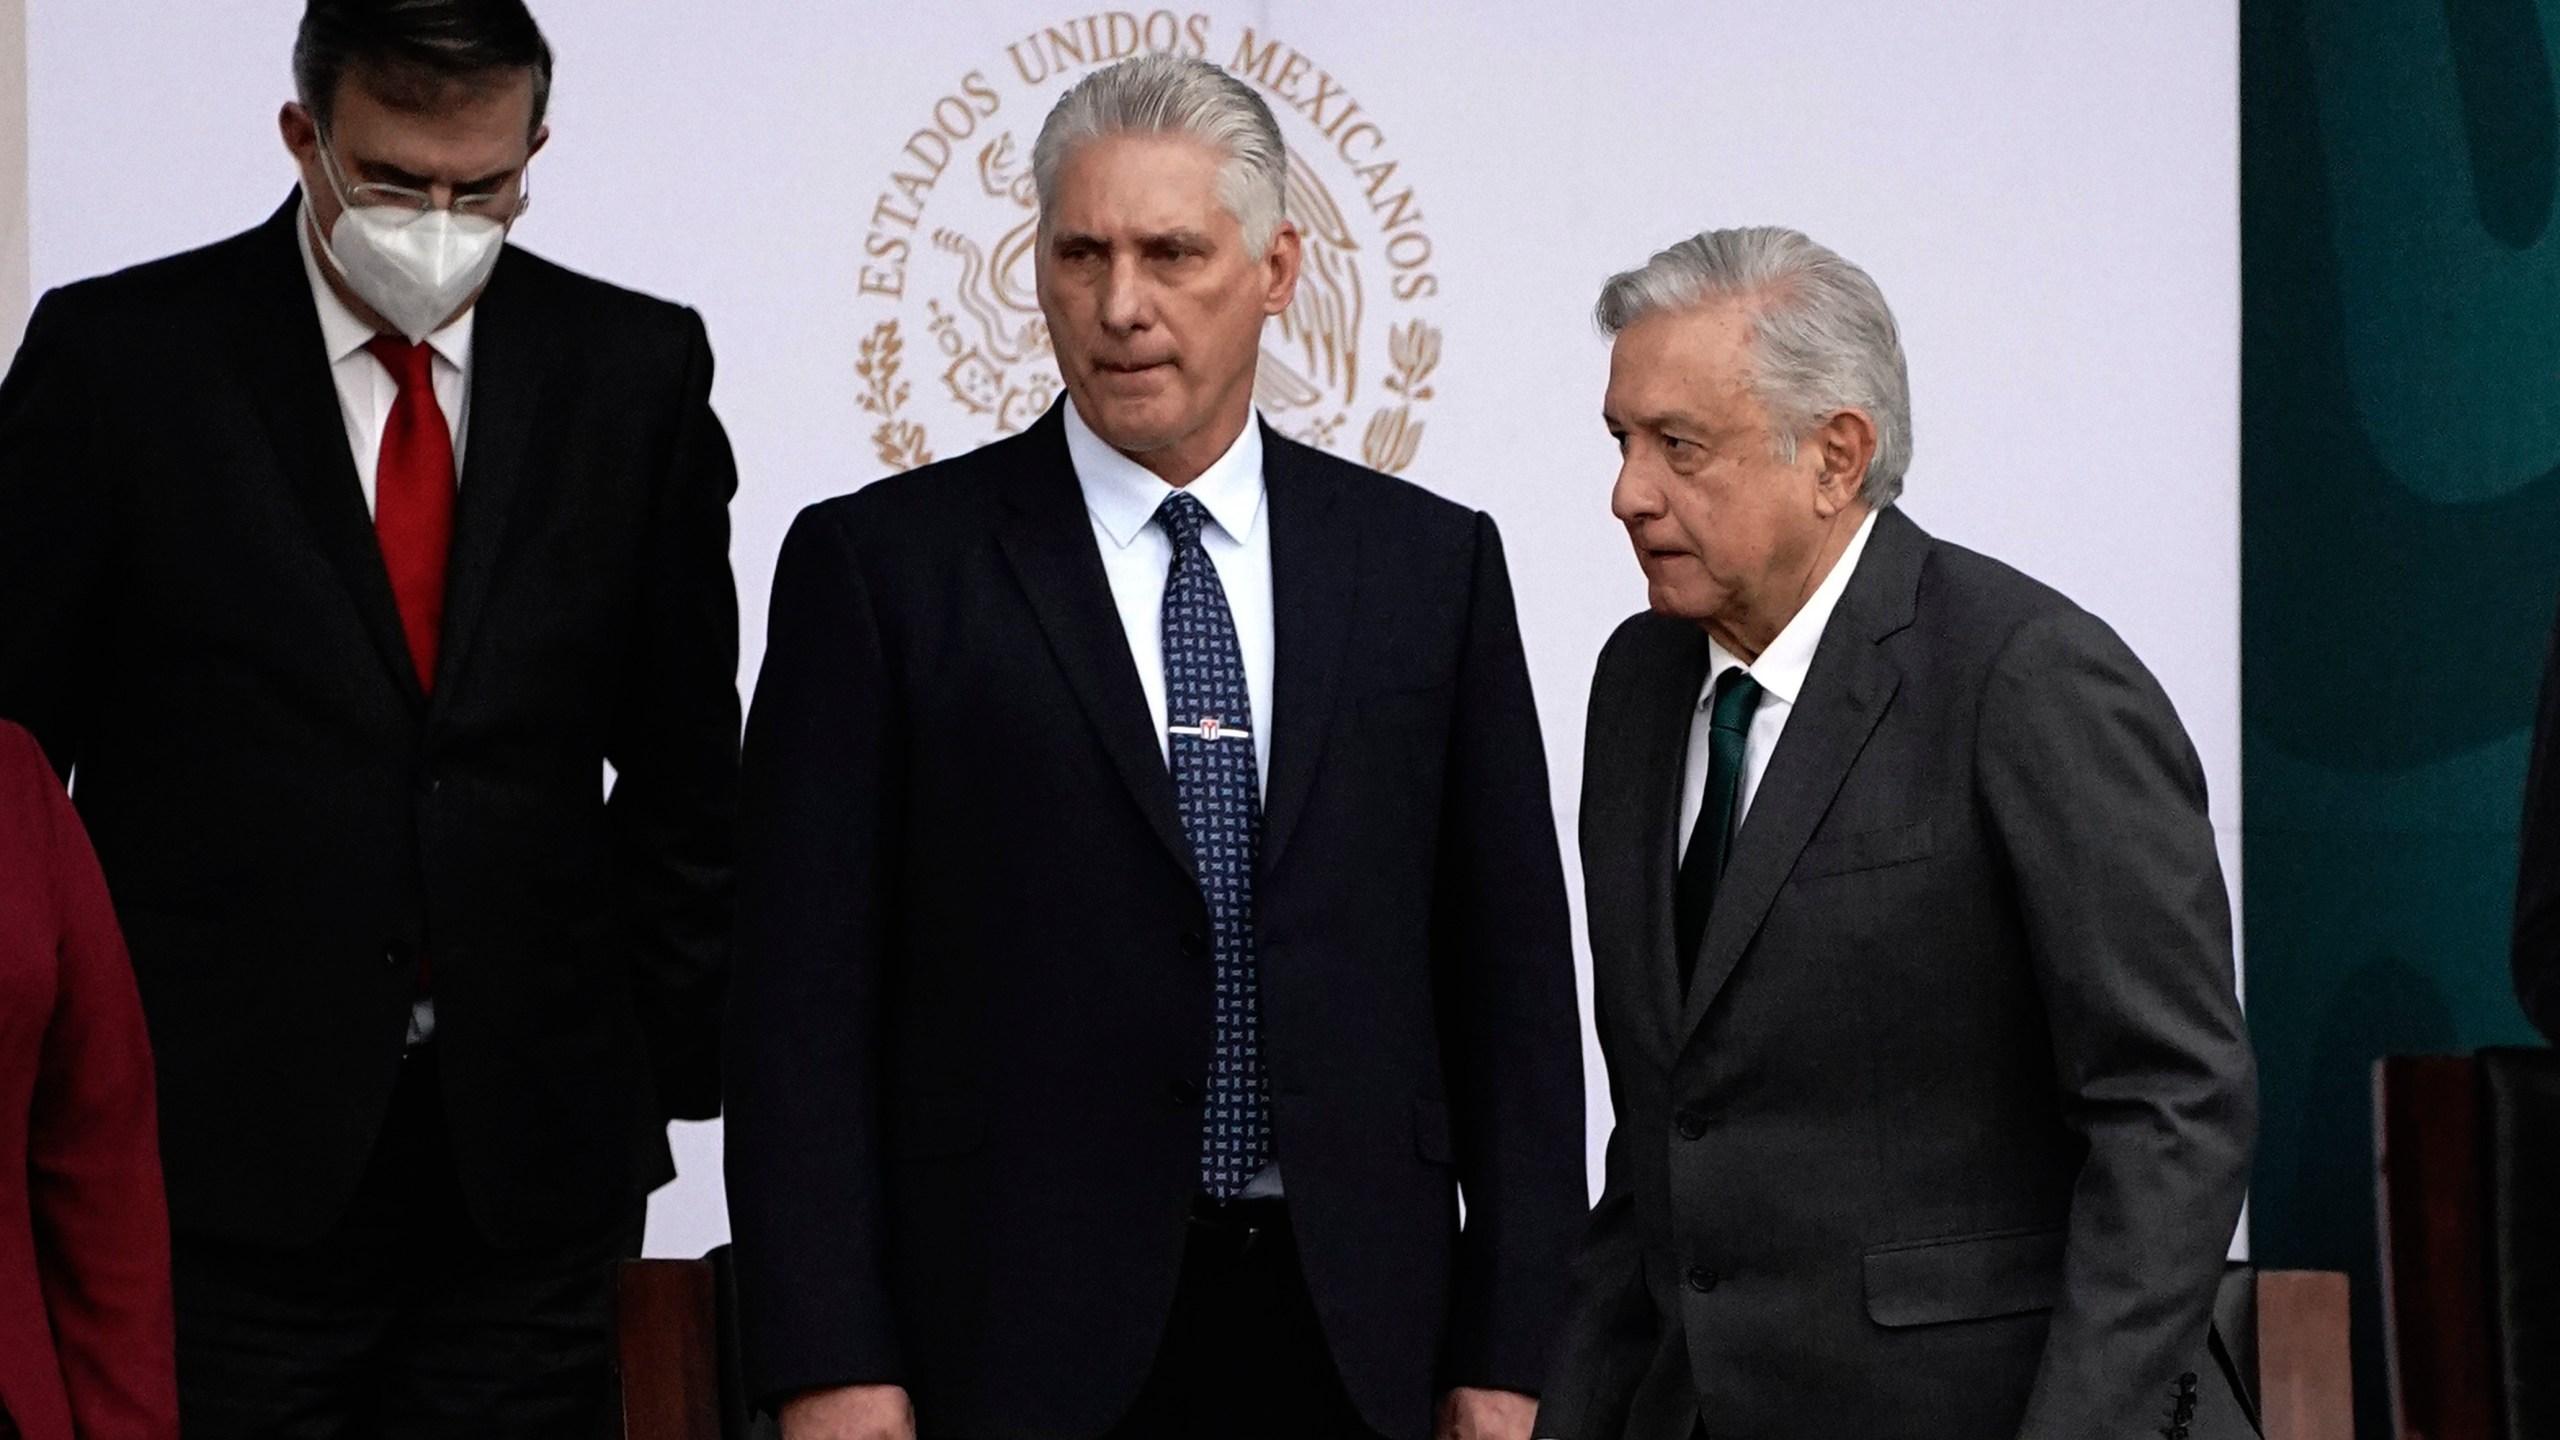 Miguel Diaz-Canel, Andres Manuel Lopez Obrador